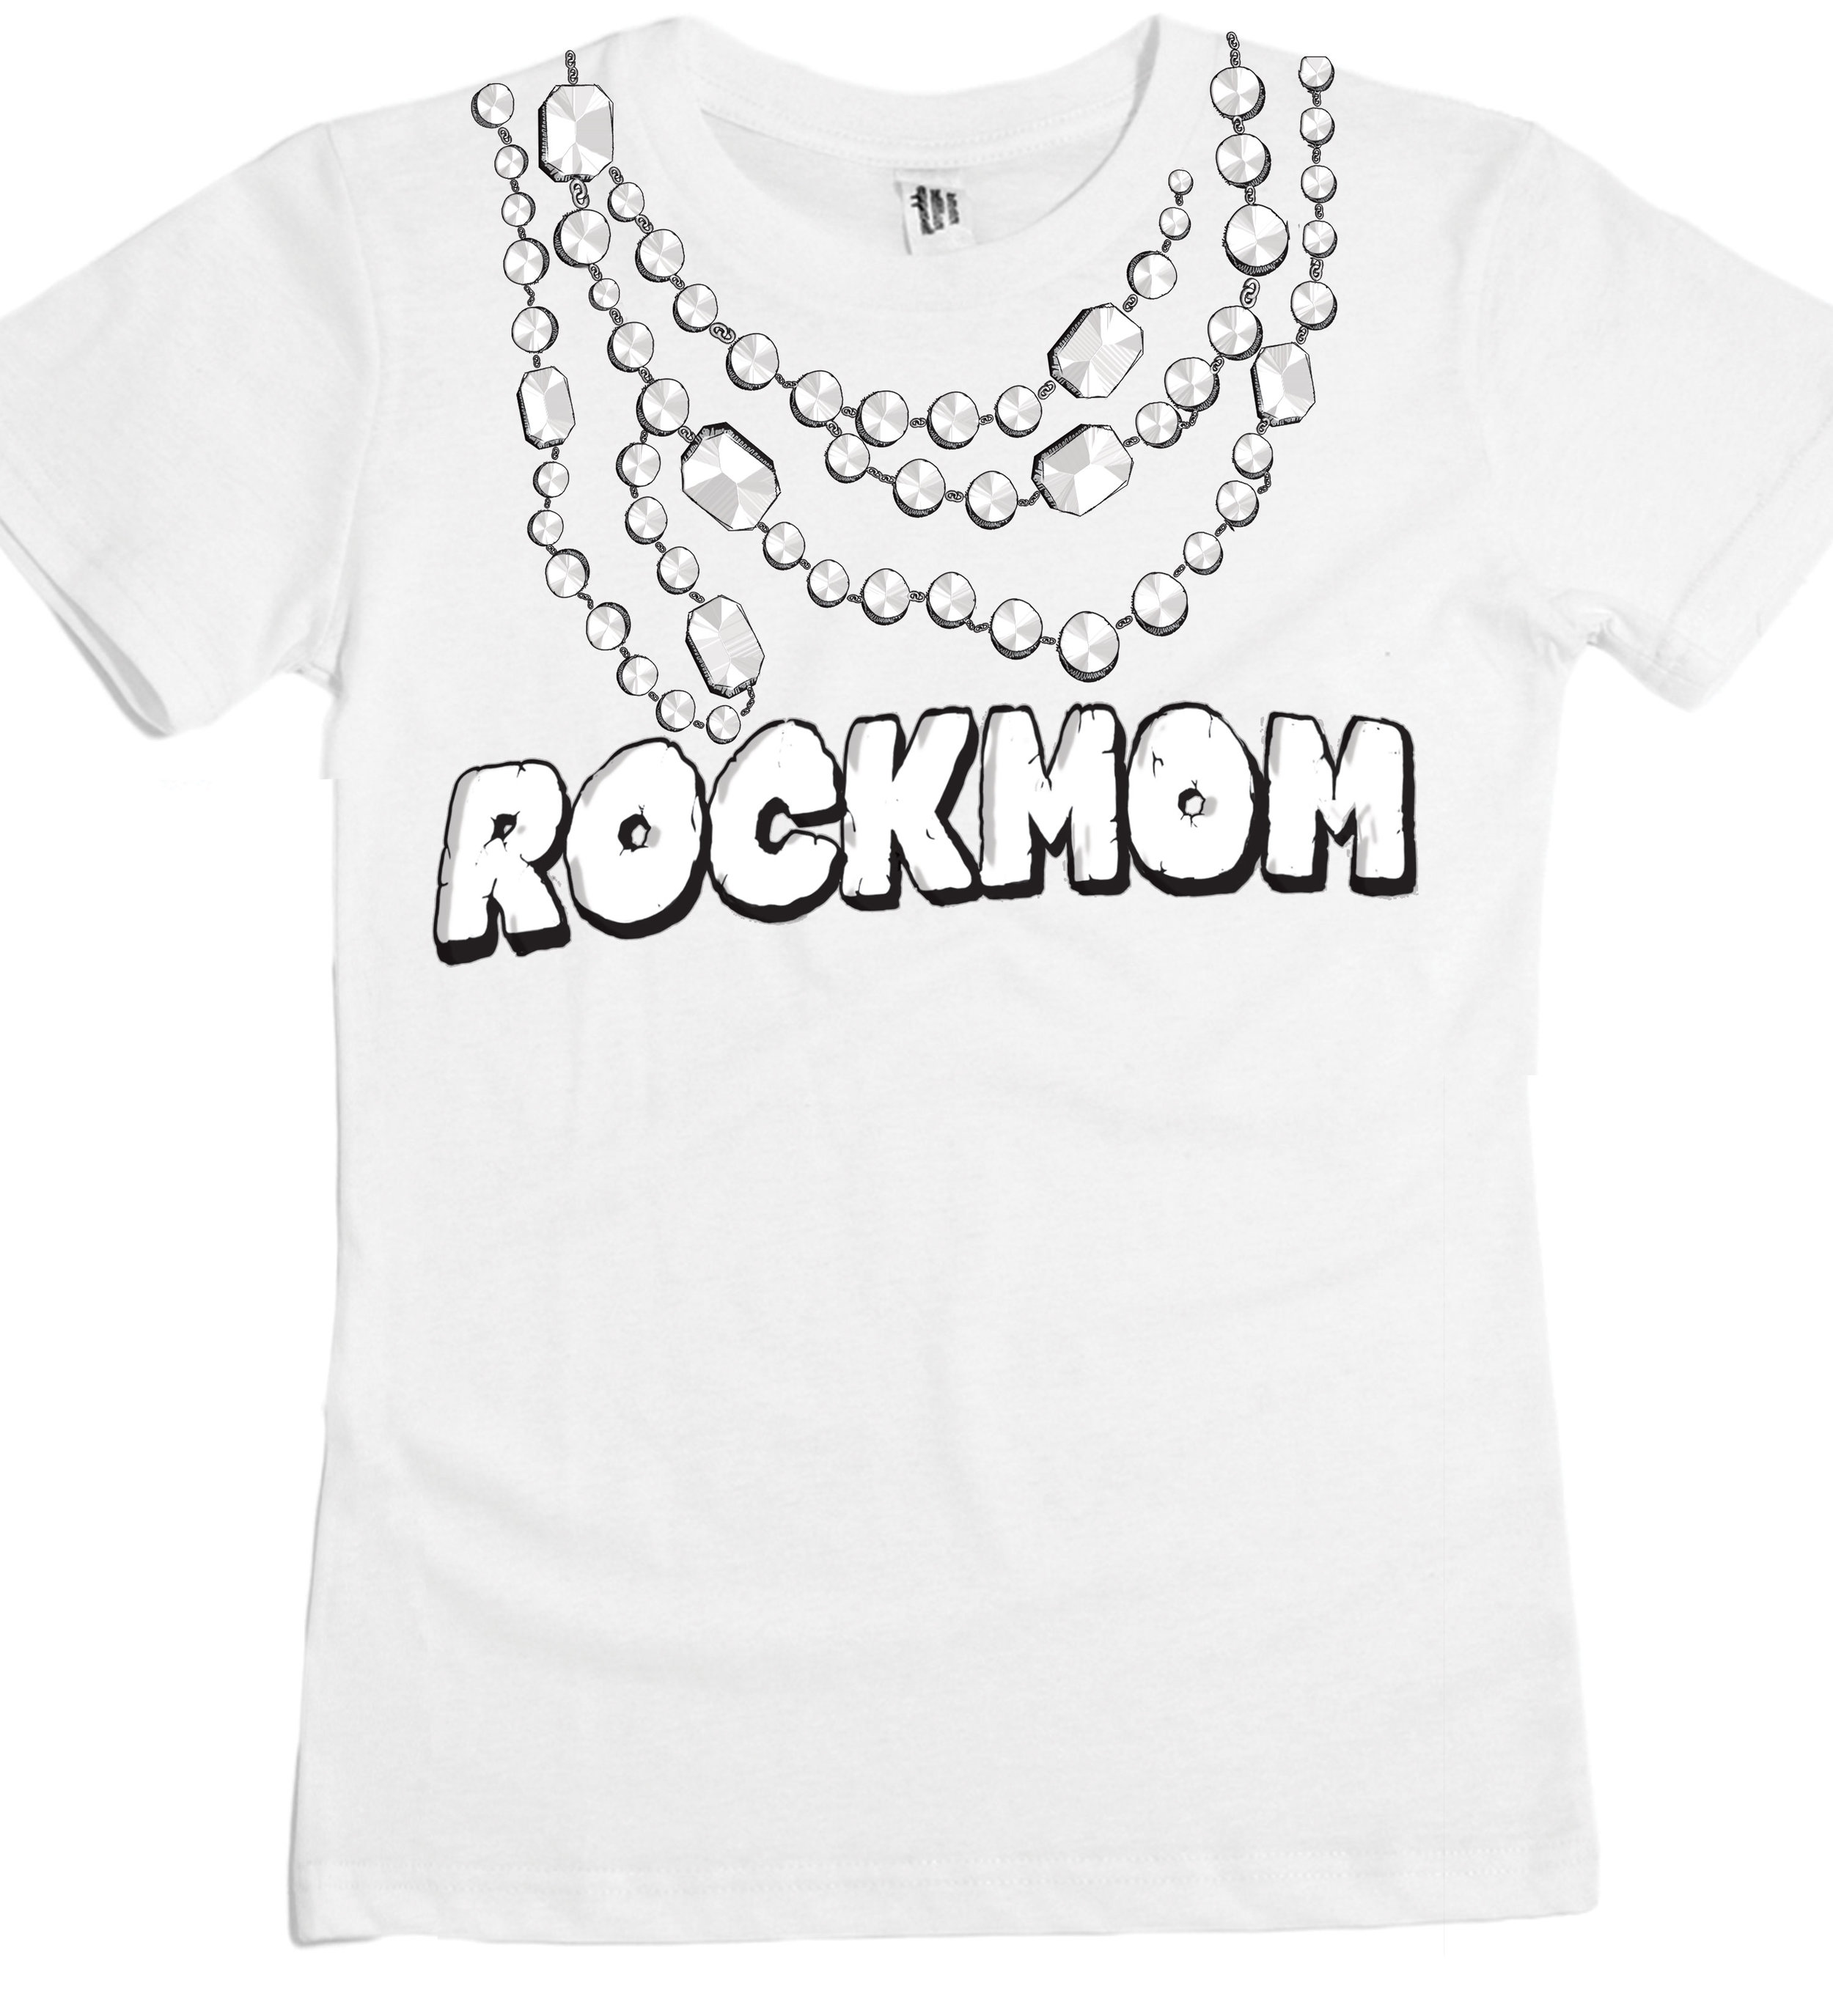 rockmom_white.jpg